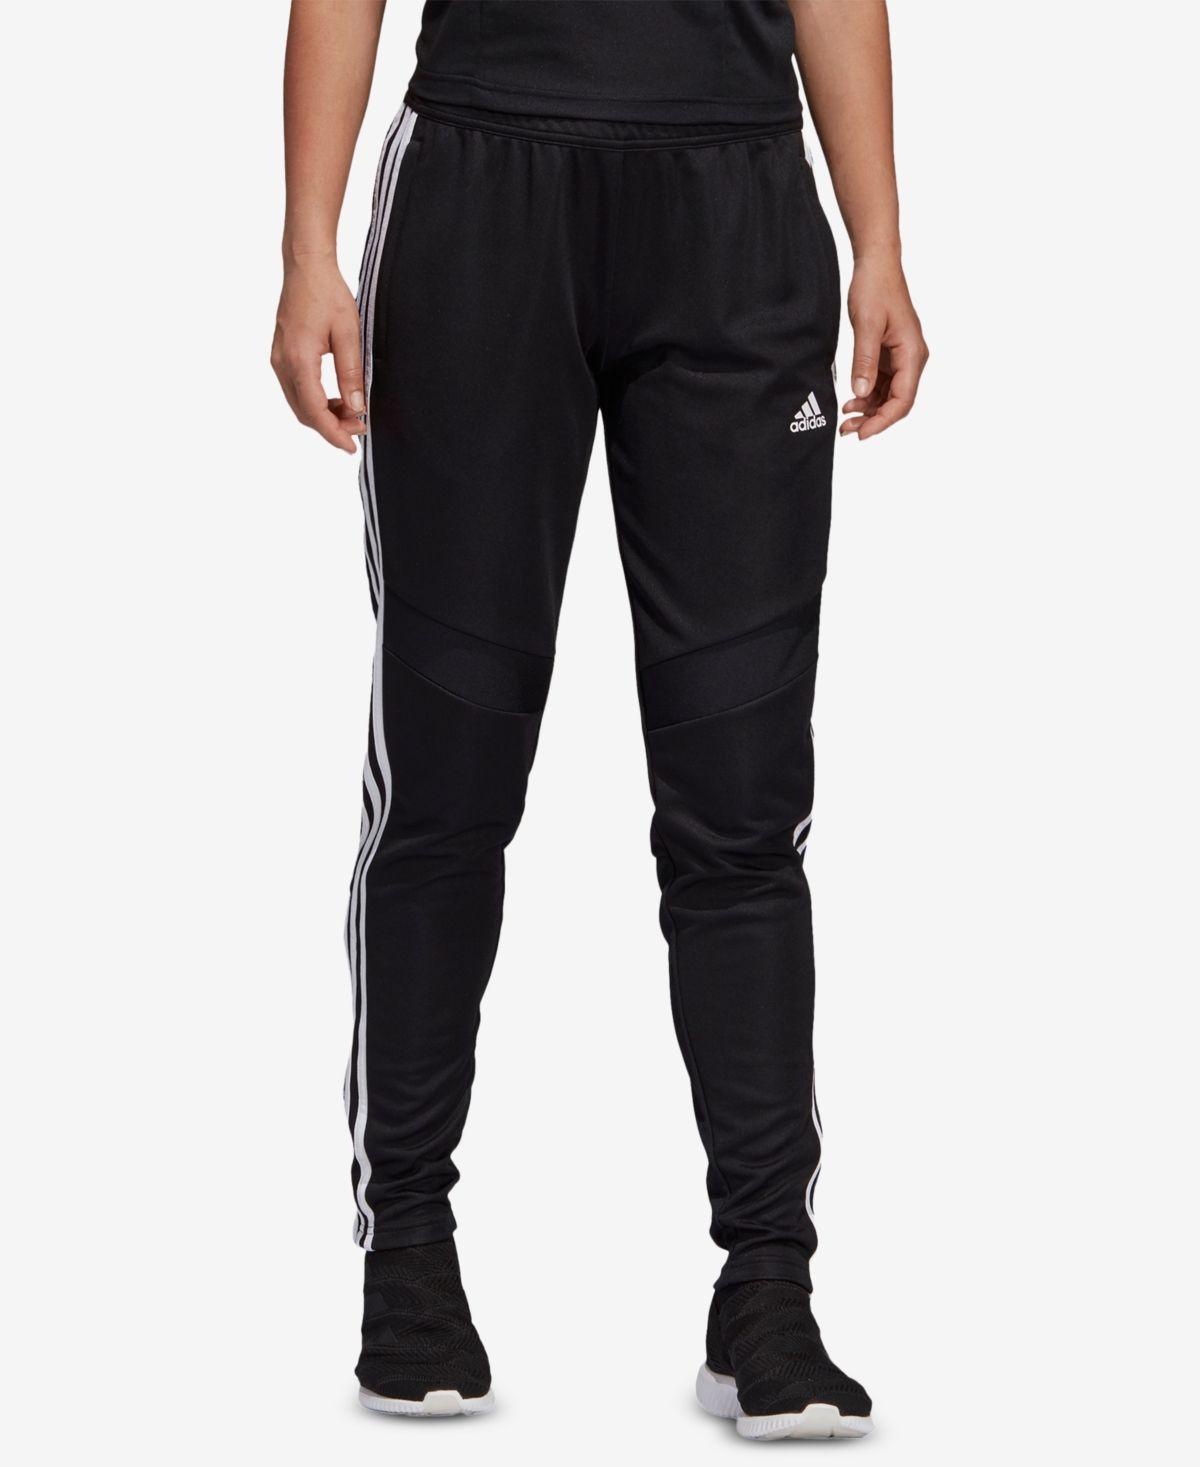 Plasticidad Asistir Remo  adidas Women's Tiro 19 ClimaCool® Training Pants & Reviews - Women - Macy's  in 2020 | Soccer pants, Adidas women, Training pants